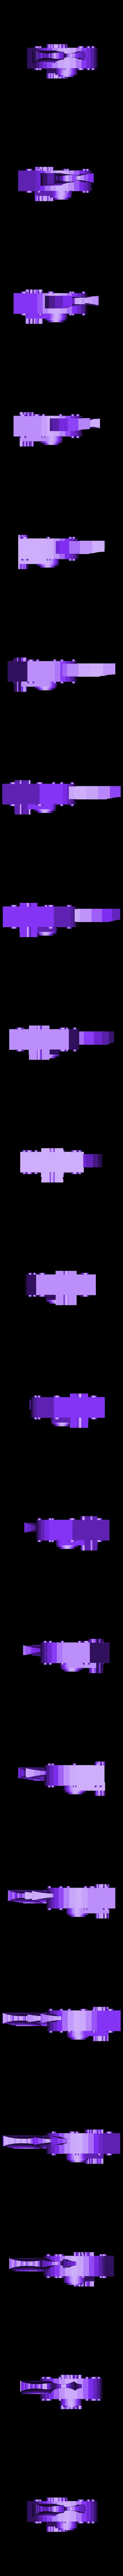 Rear_Rotor.stl Télécharger fichier STL gratuit GyroBomber nain • Objet imprimable en 3D, mrhers2